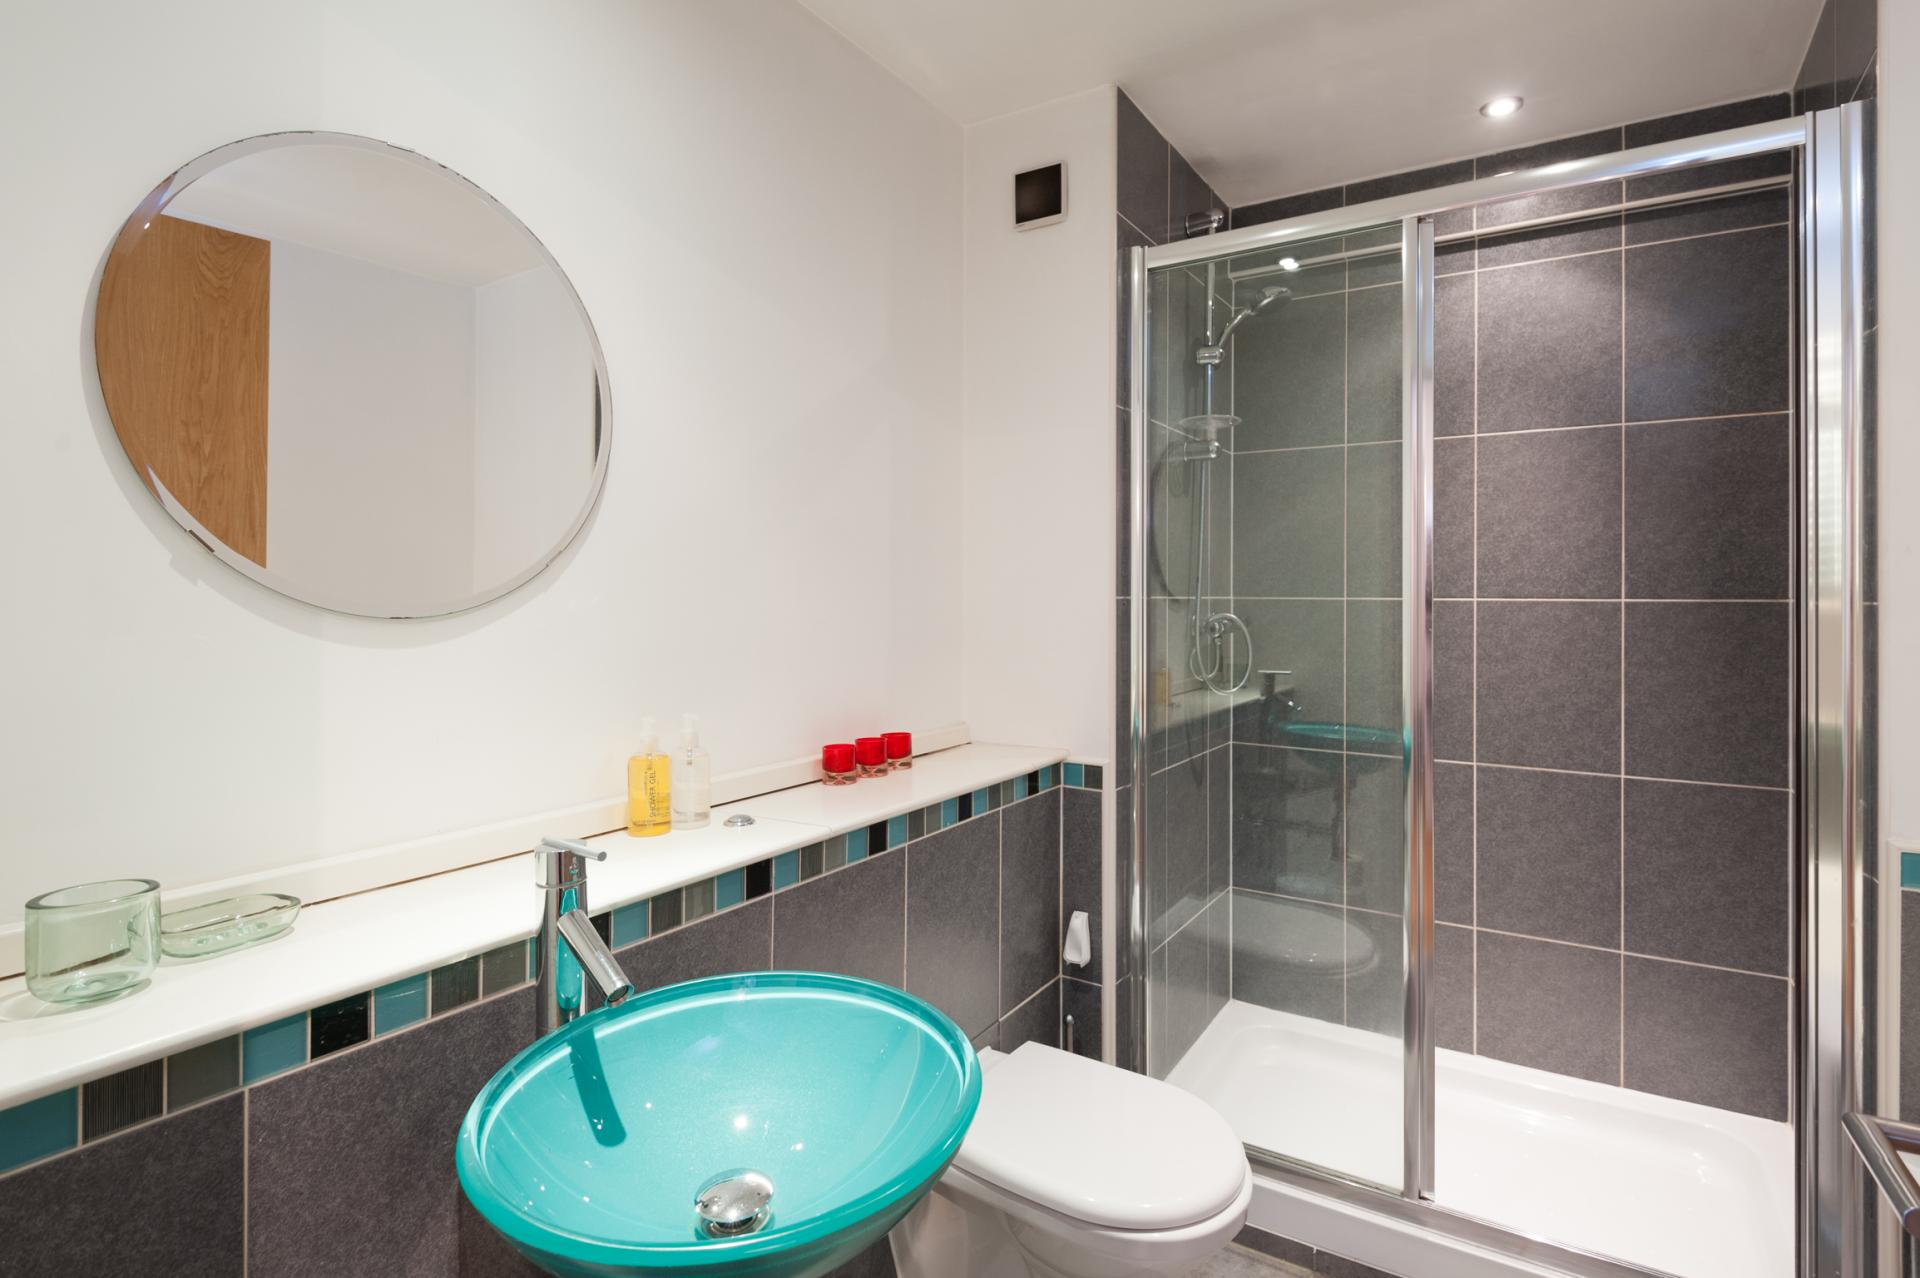 Sink at Metropole Apartment